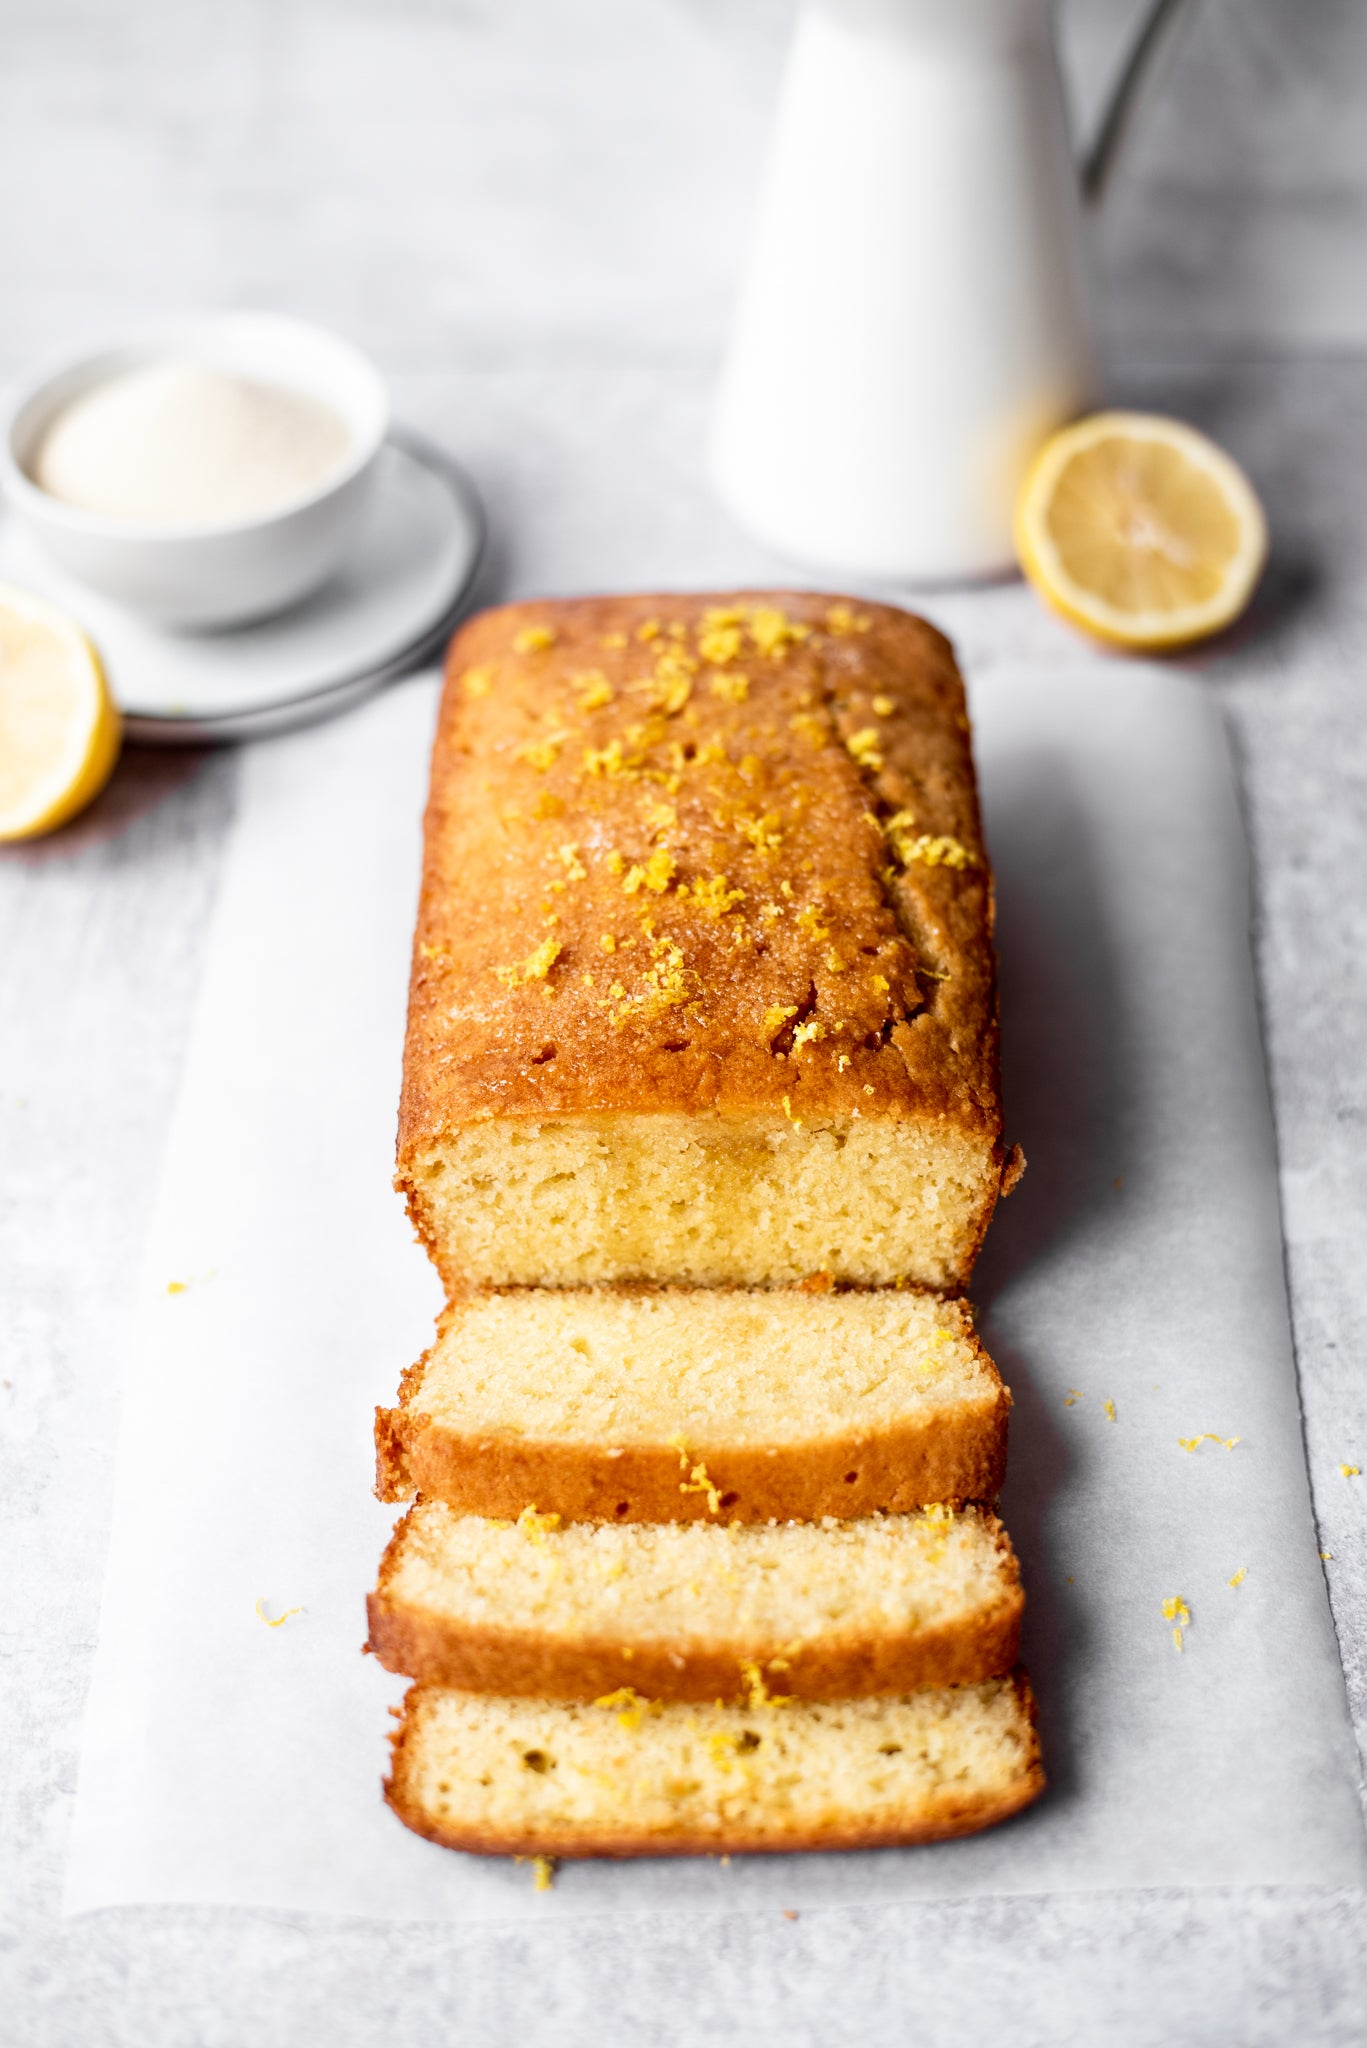 Lemon-Drizzle-Cake-WEB-RES-3_1.jpg